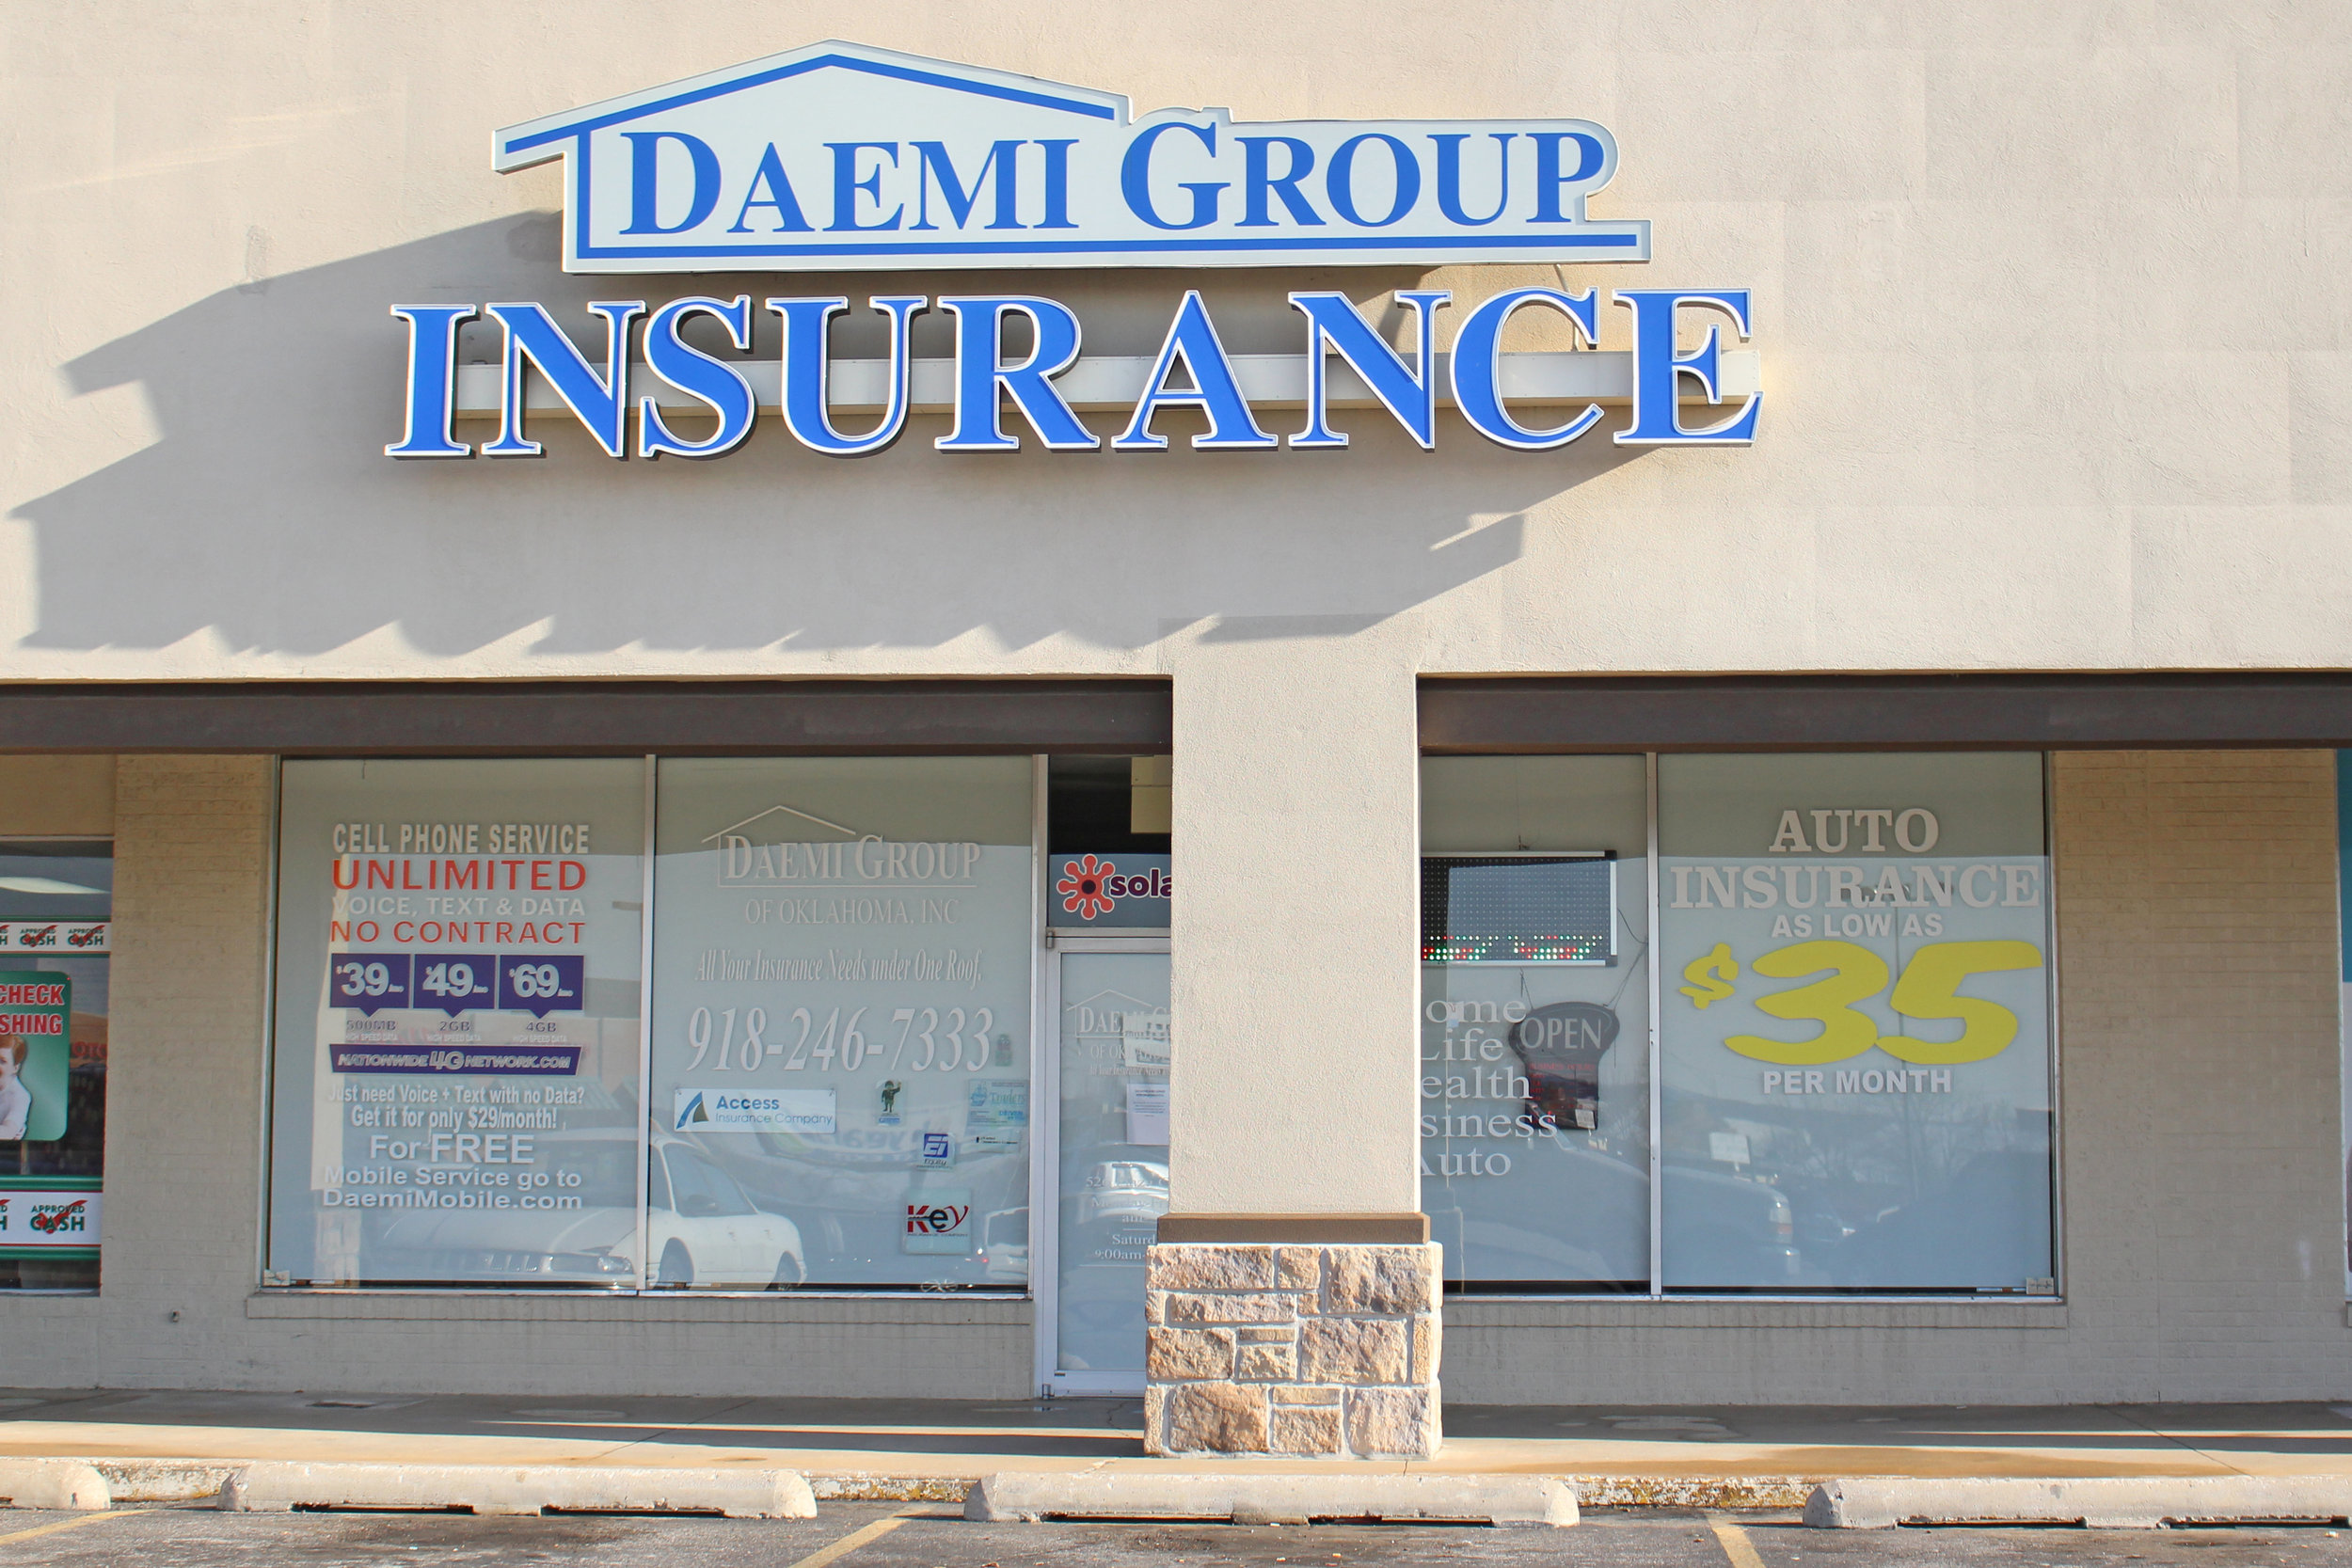 Daemi group insurance - shops at adams road 526 plaza court